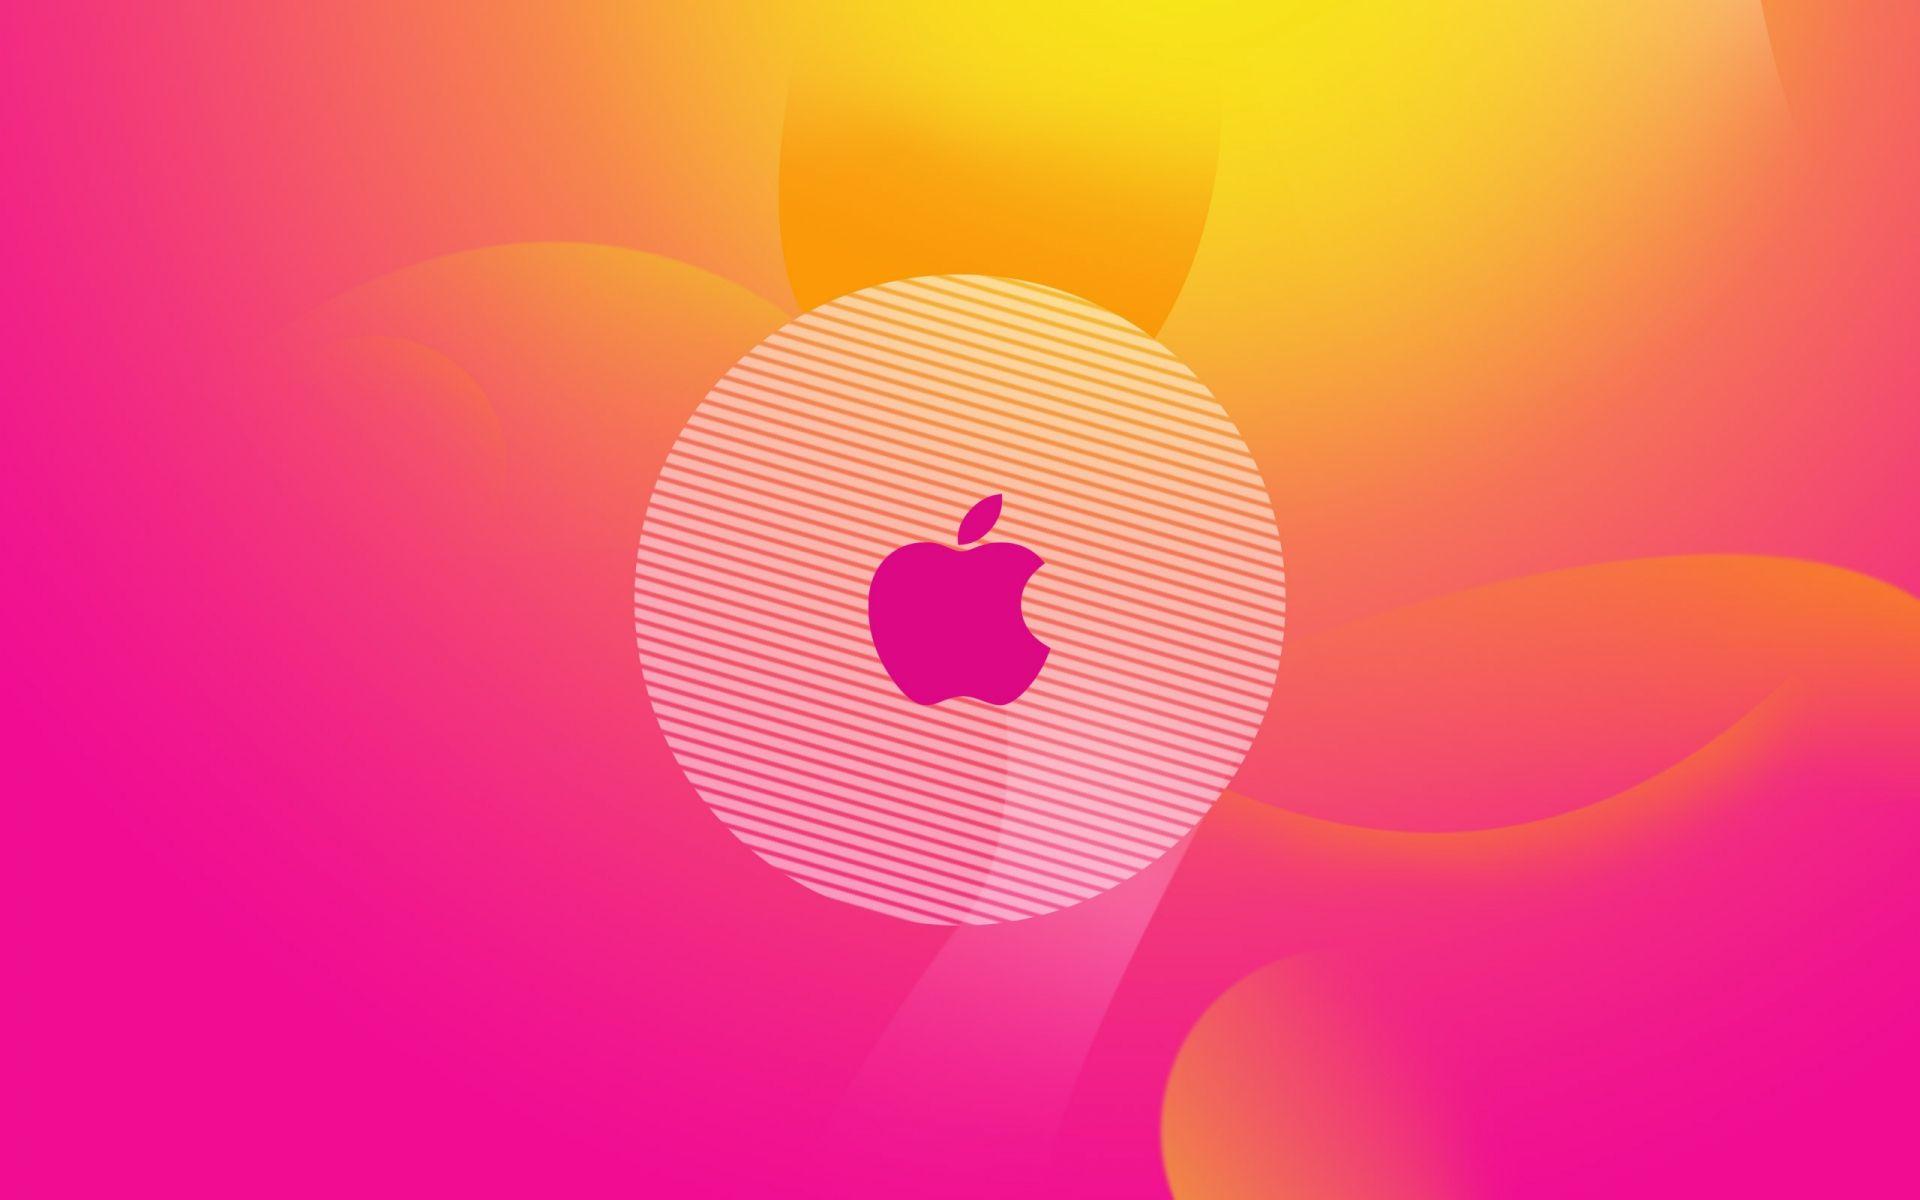 Apple Logo Flower - Bing images